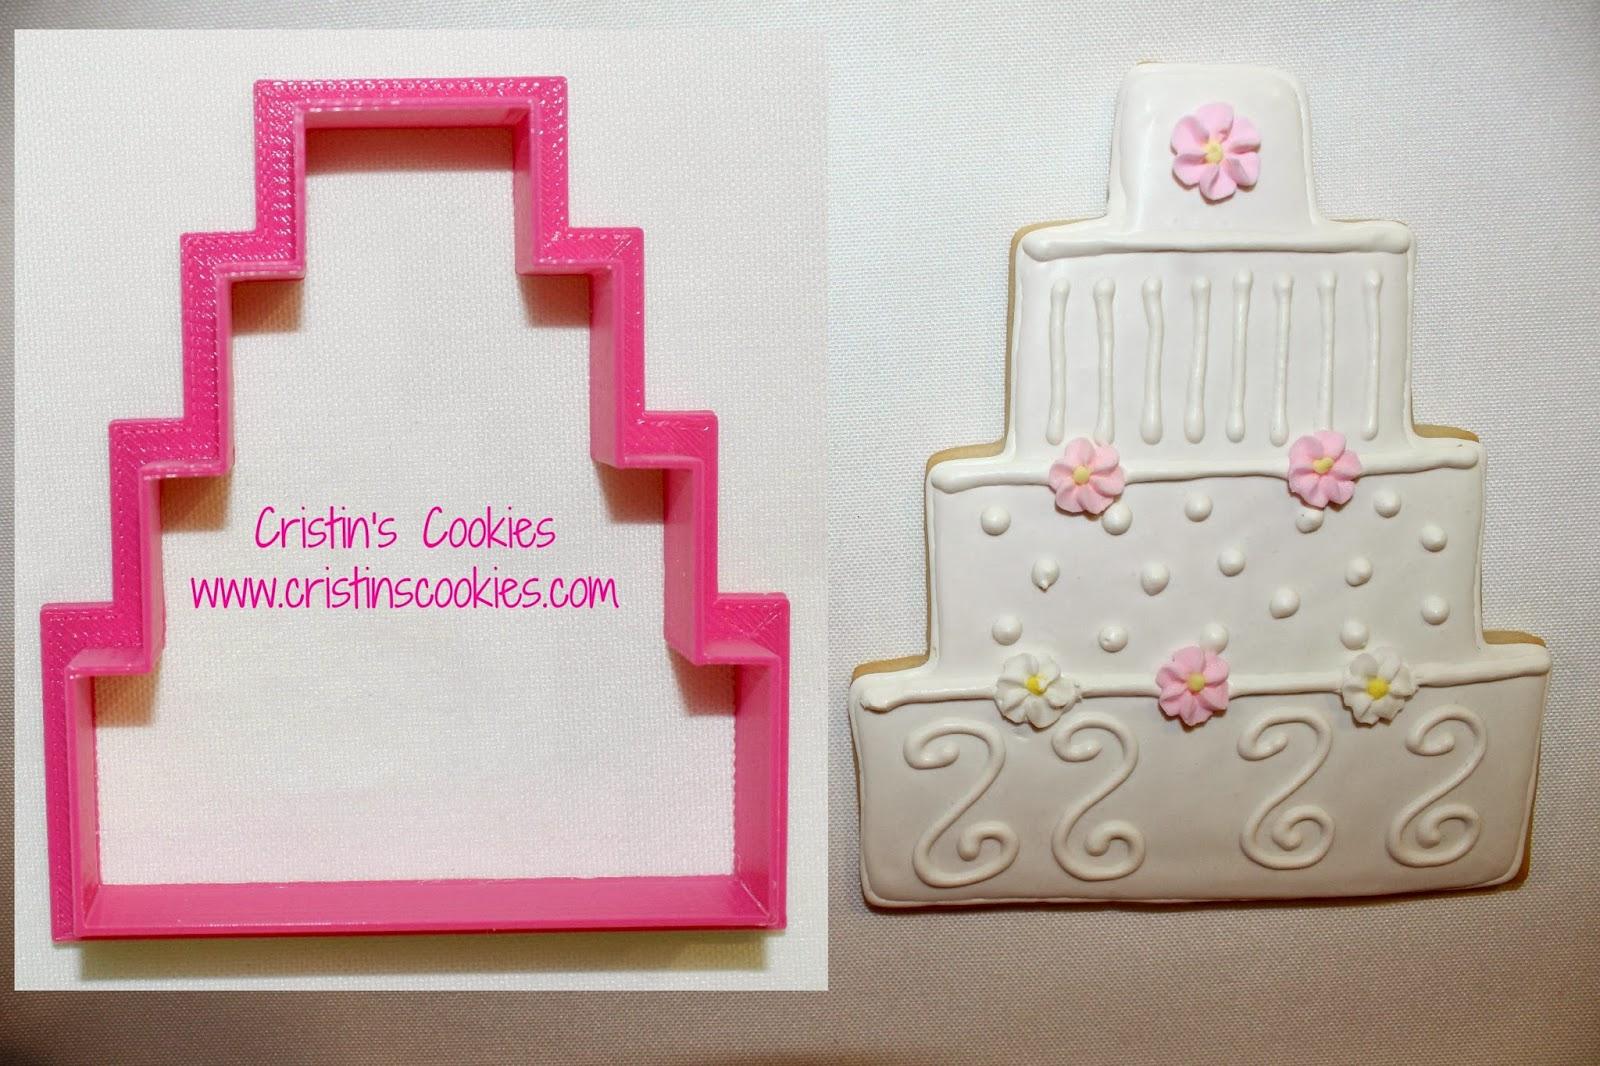 She Said Yes. I Had A Customer Ask For Wedding Cake Cookies.